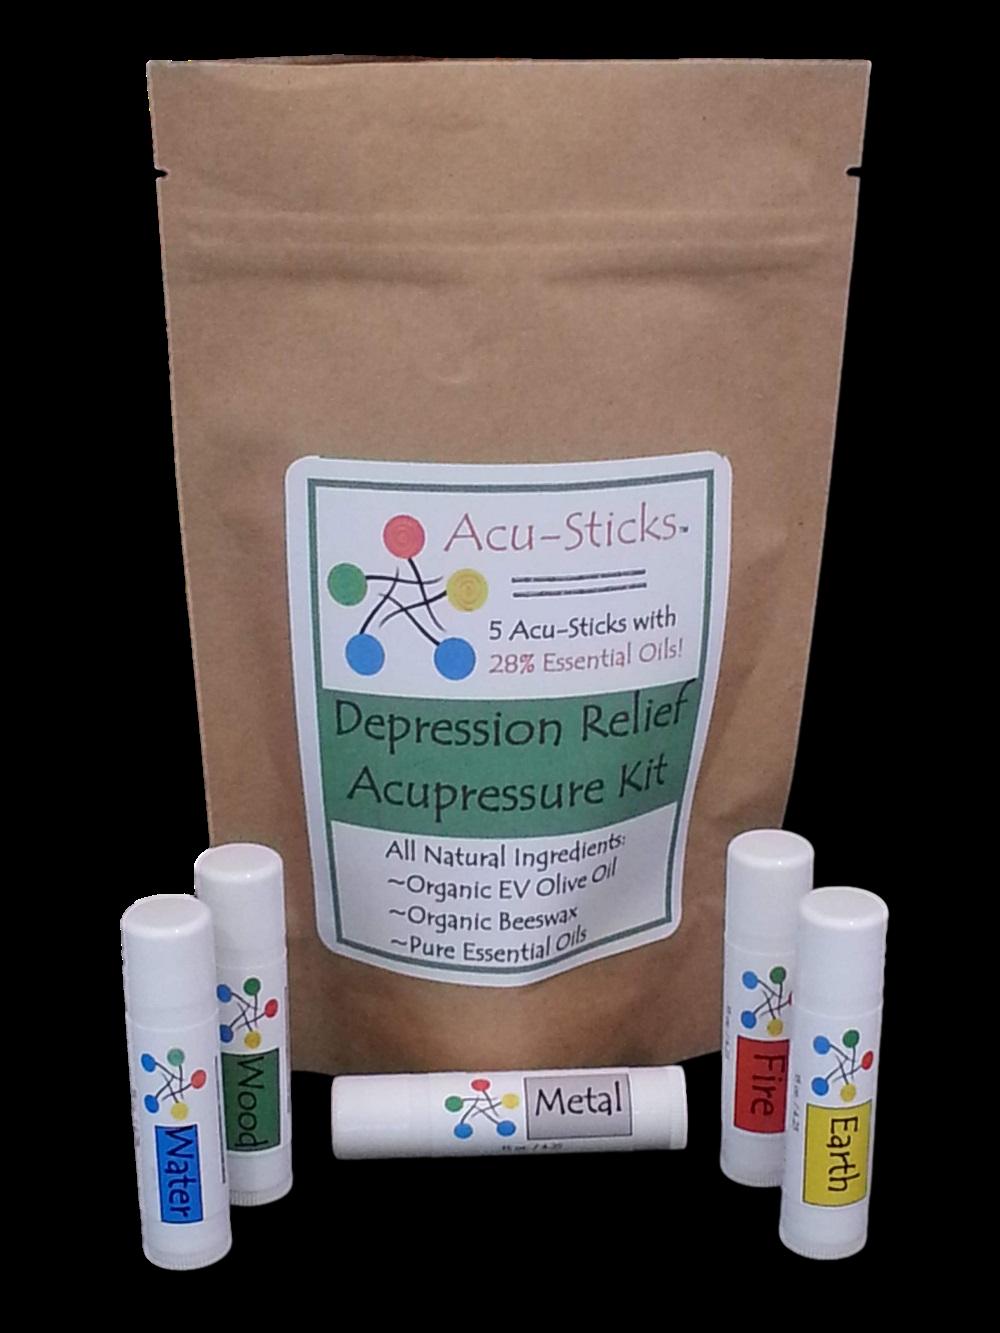 depression-relief-acupressure kit with essential oils